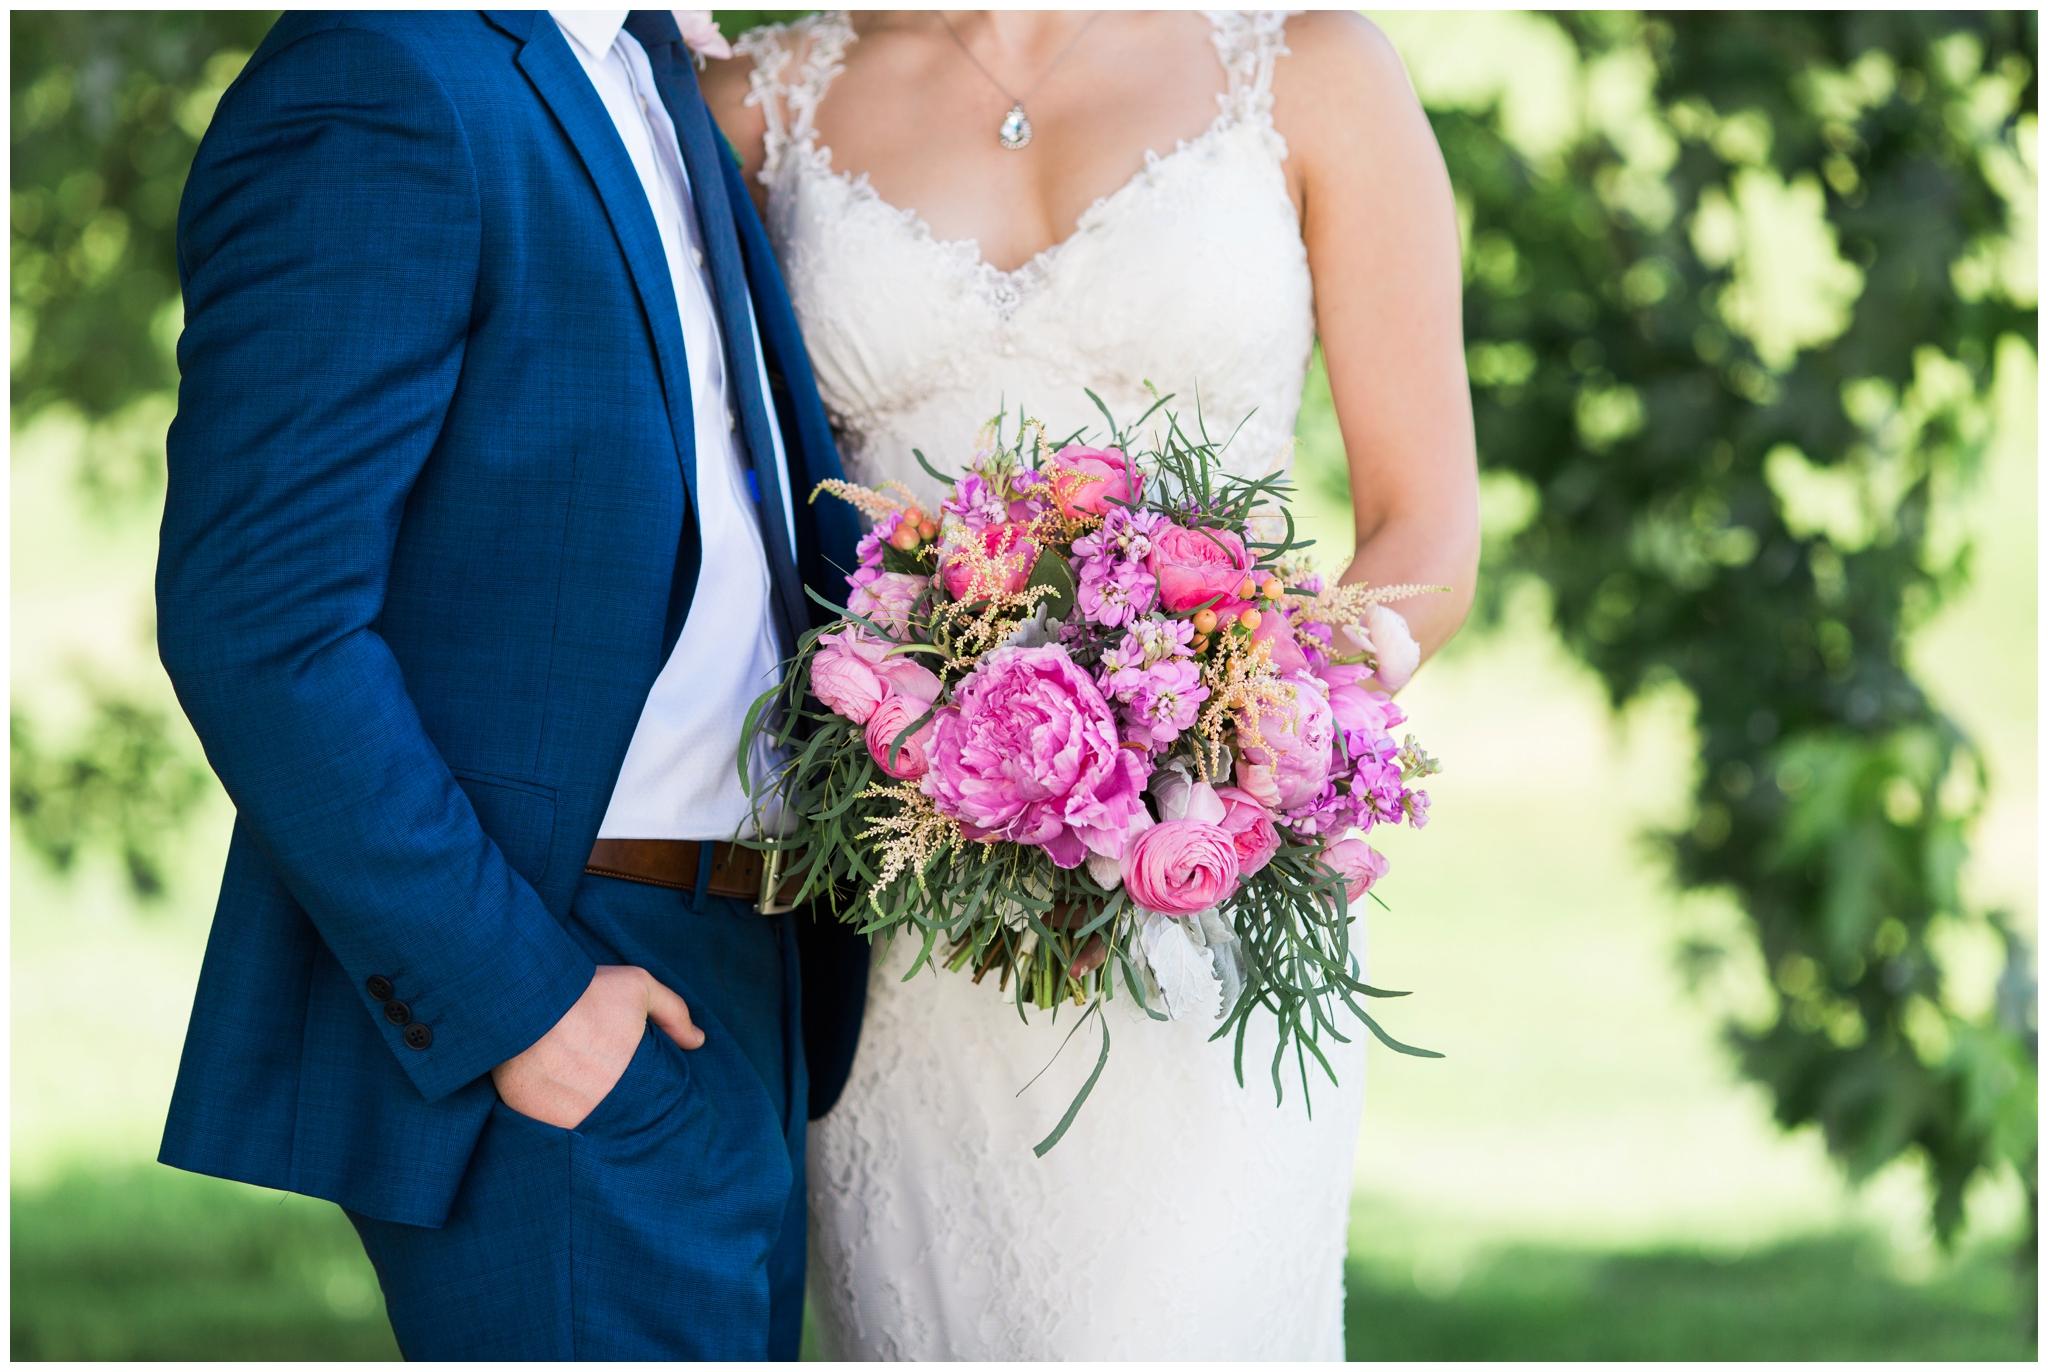 emily grace photography stoltzfus homestead and garden wedding